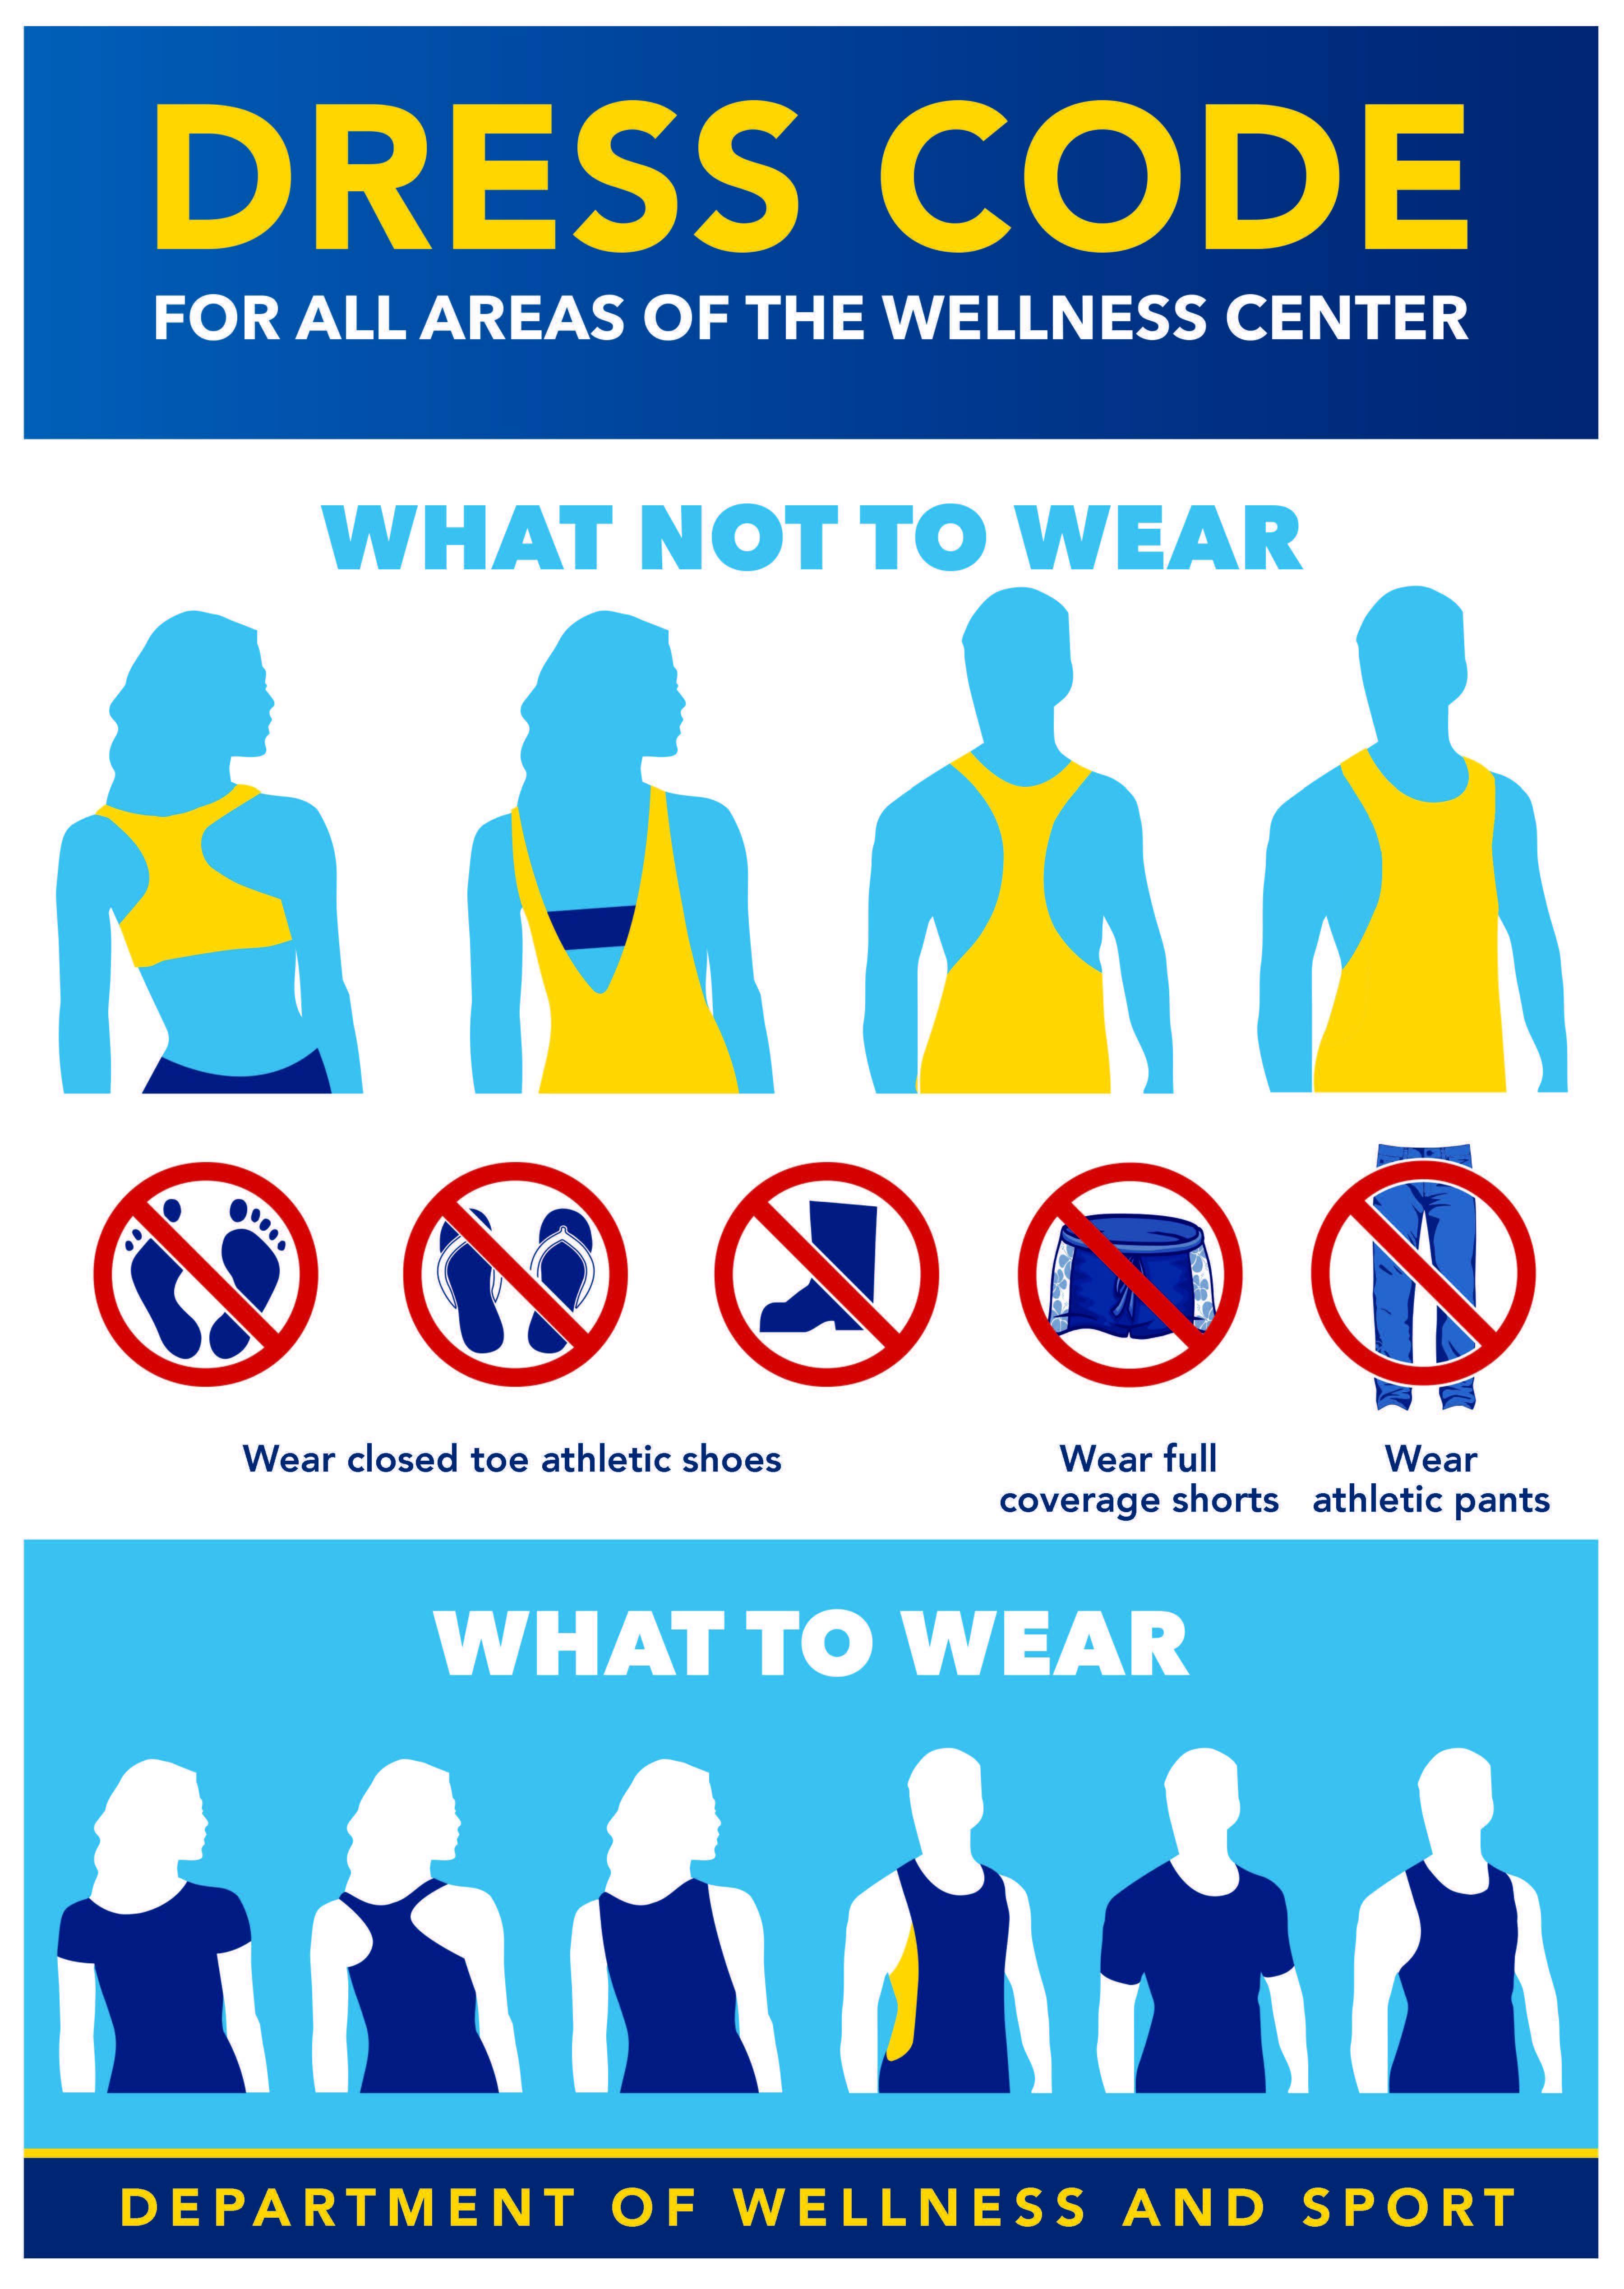 Dress Code Images